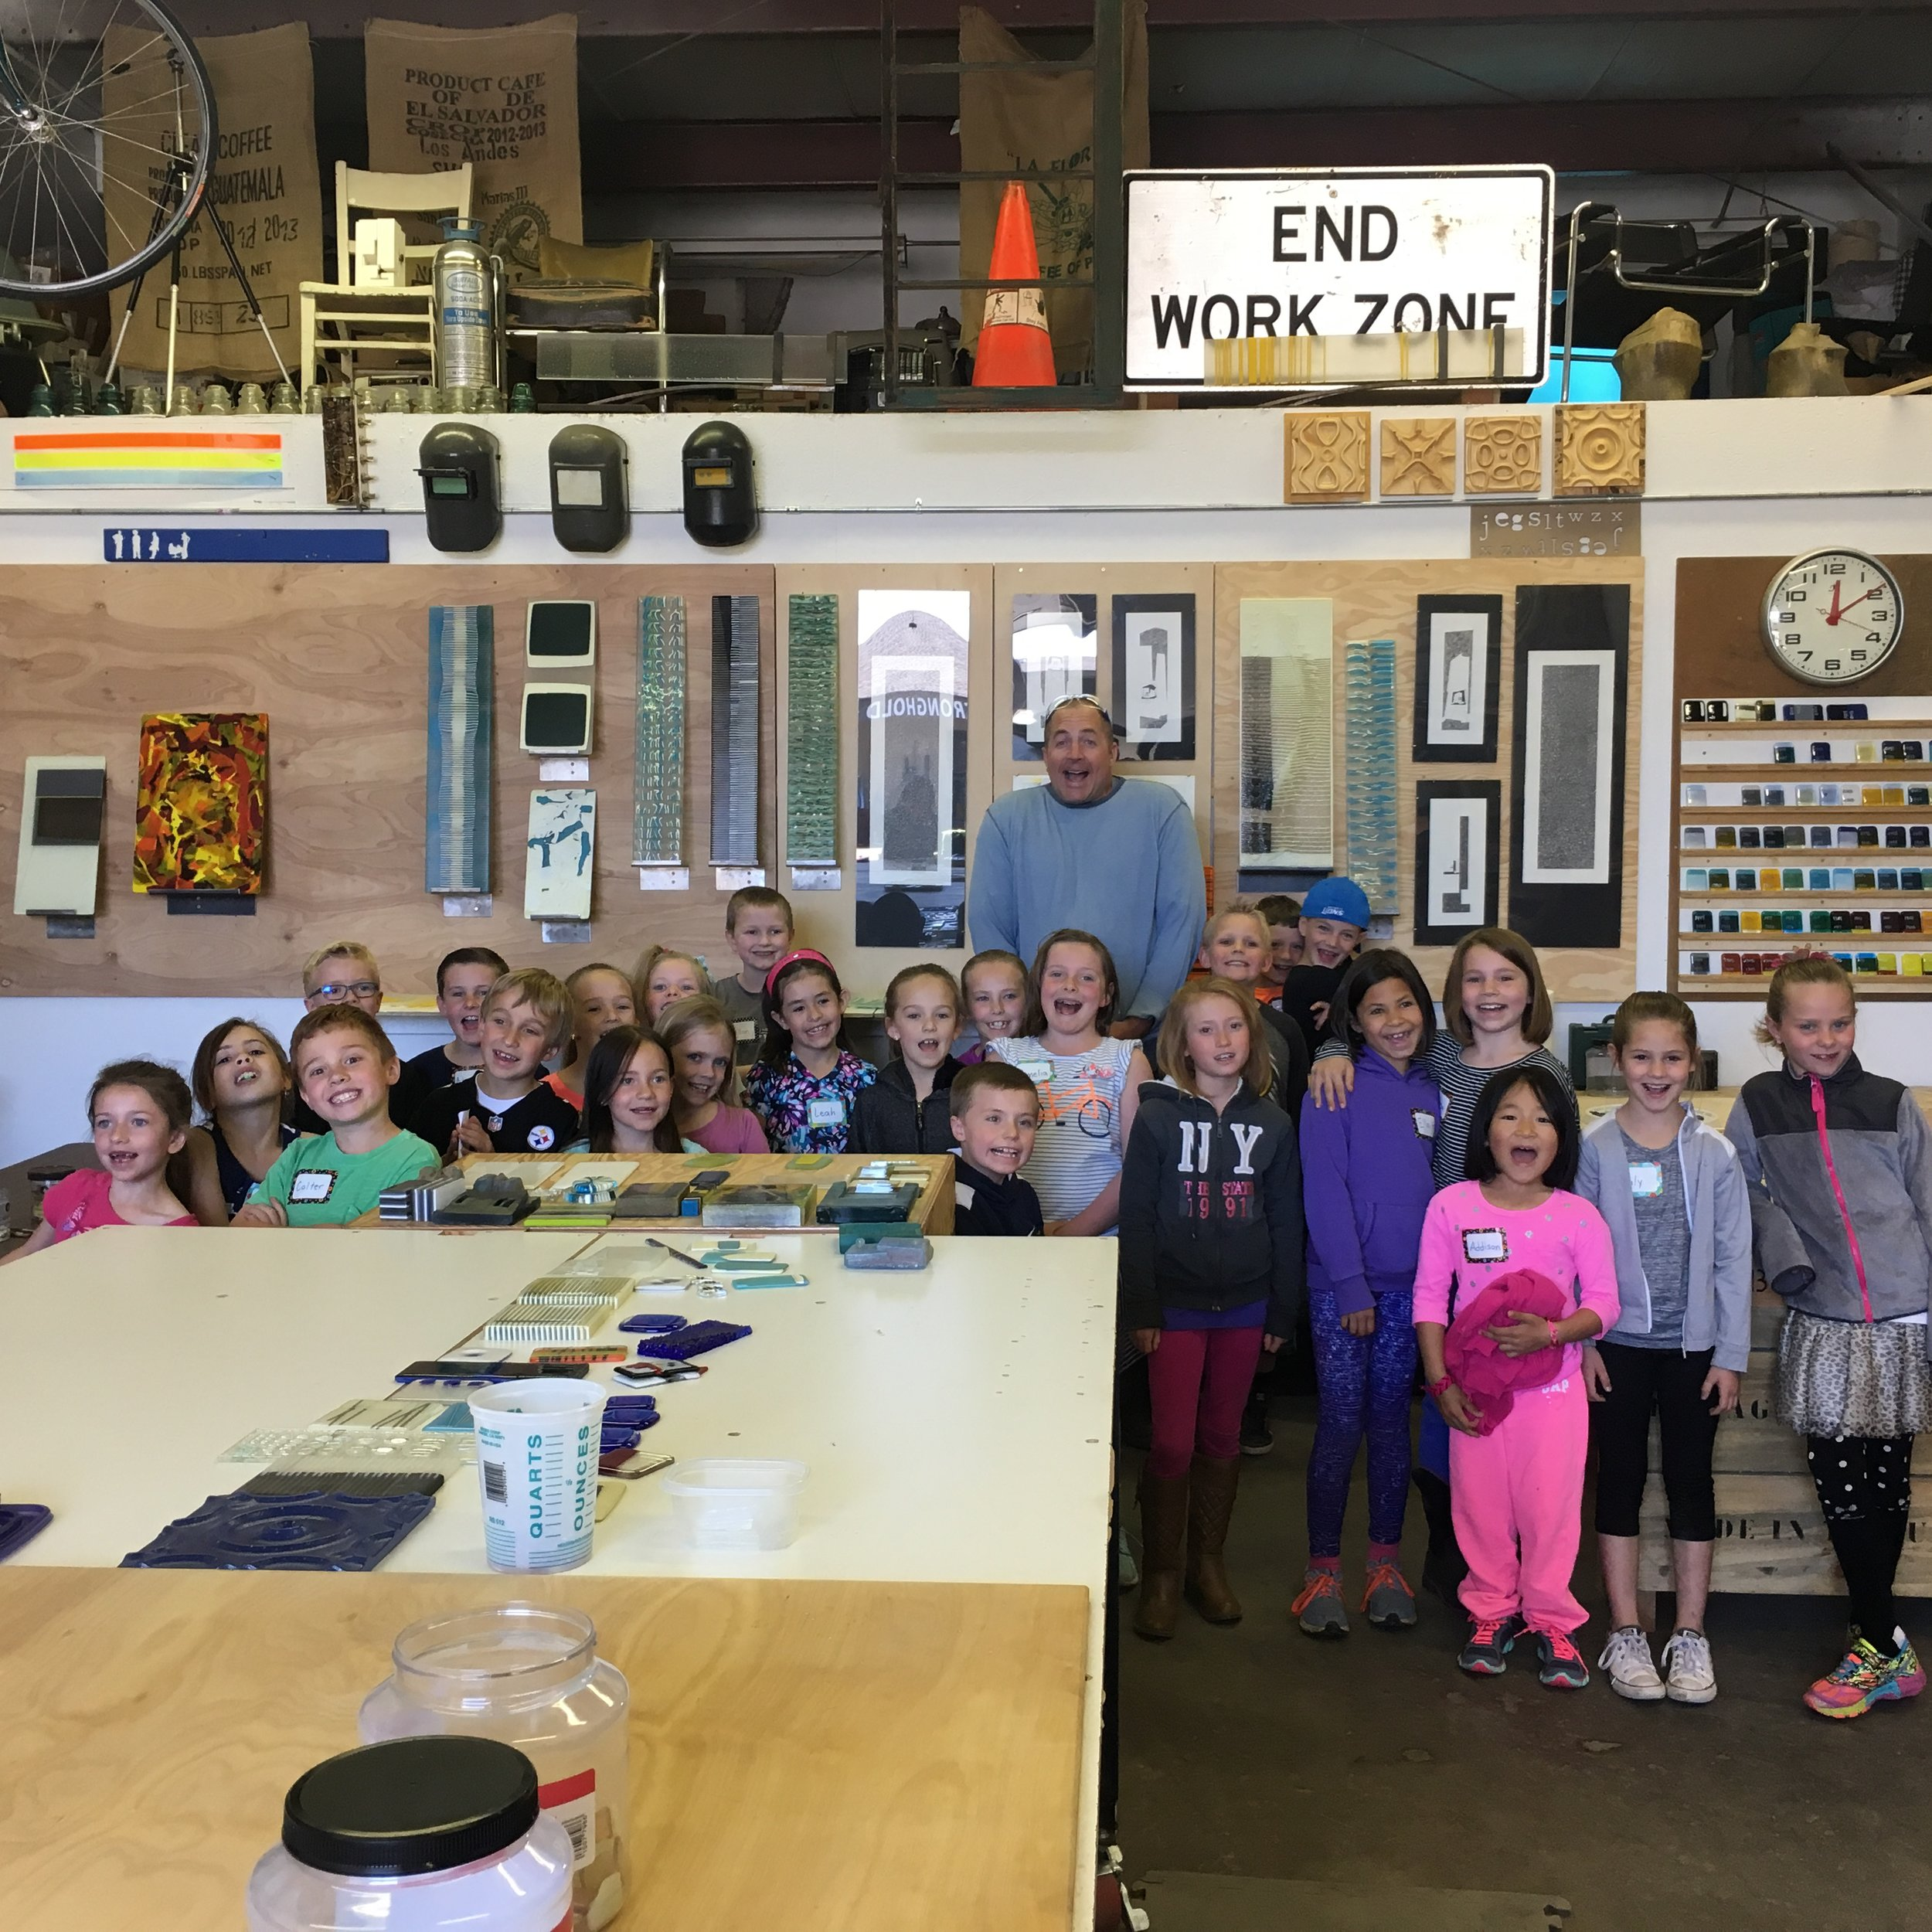 Monforton elementary School, 2nd graders - Bozeman, MT